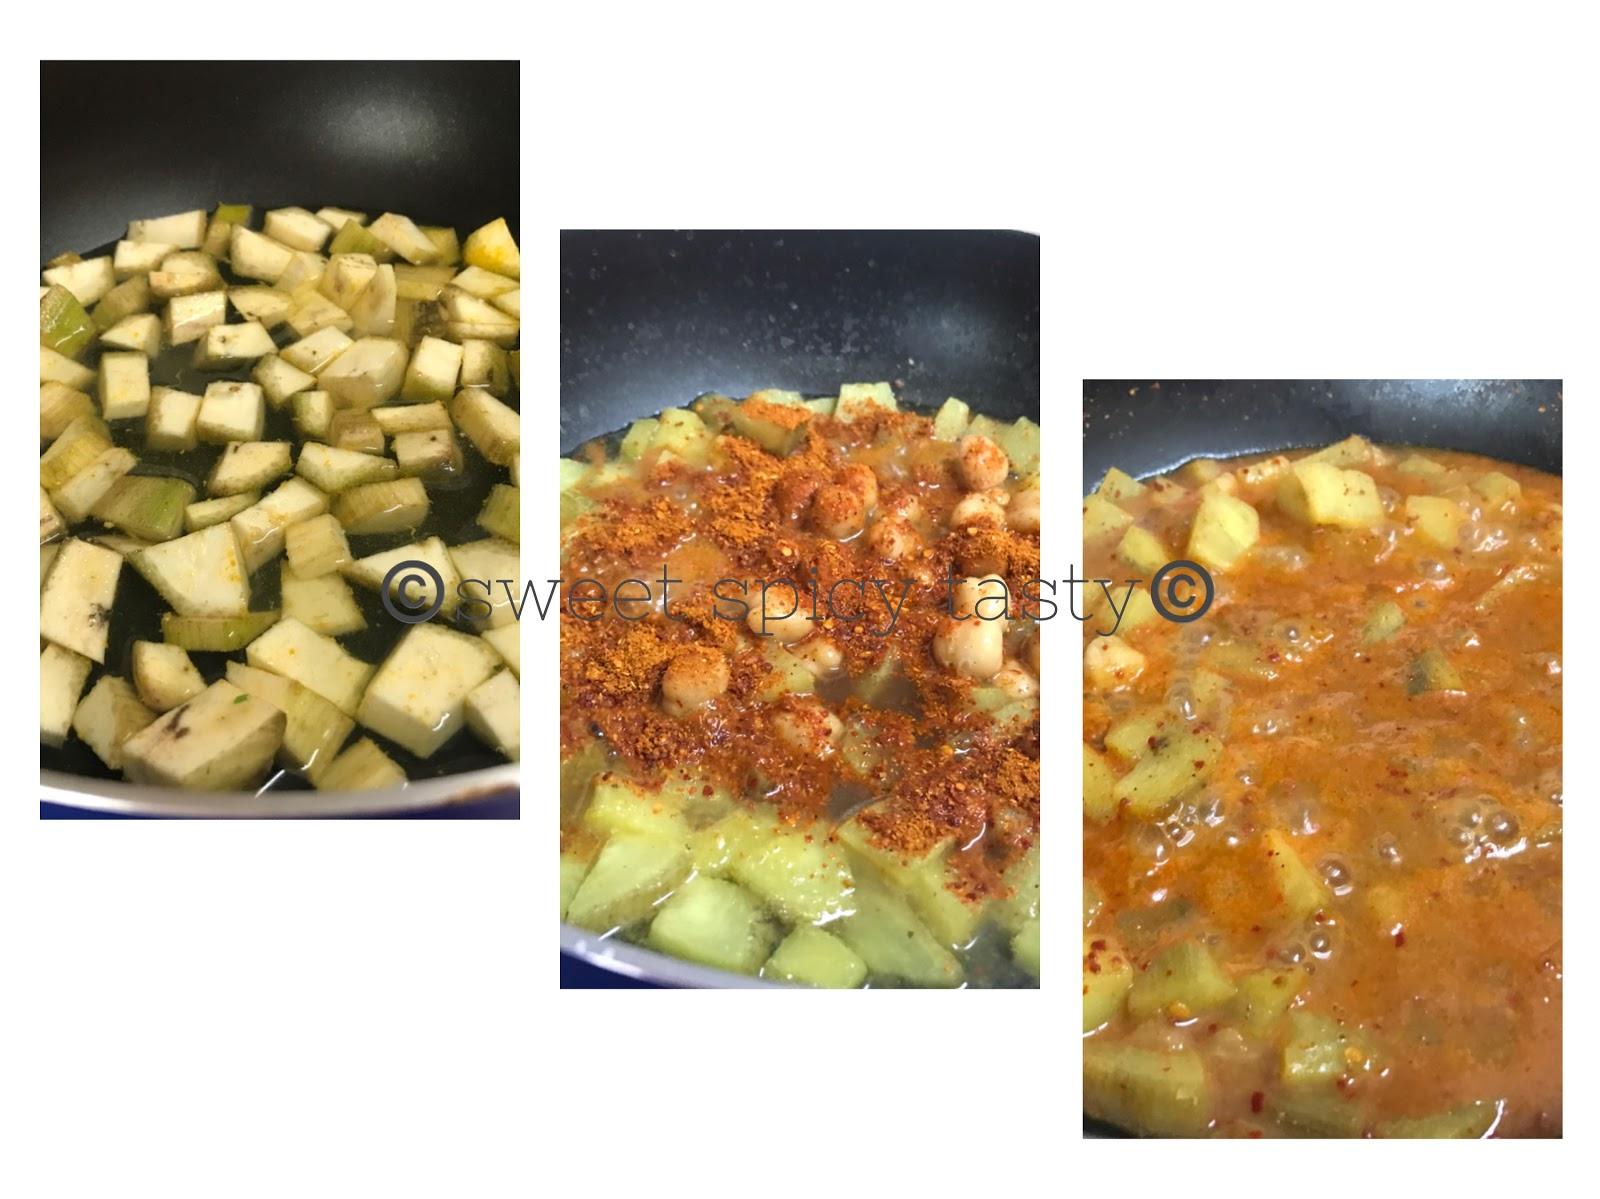 83a29badebbd Add the boiled thoor dhall  thuvaram paruppu